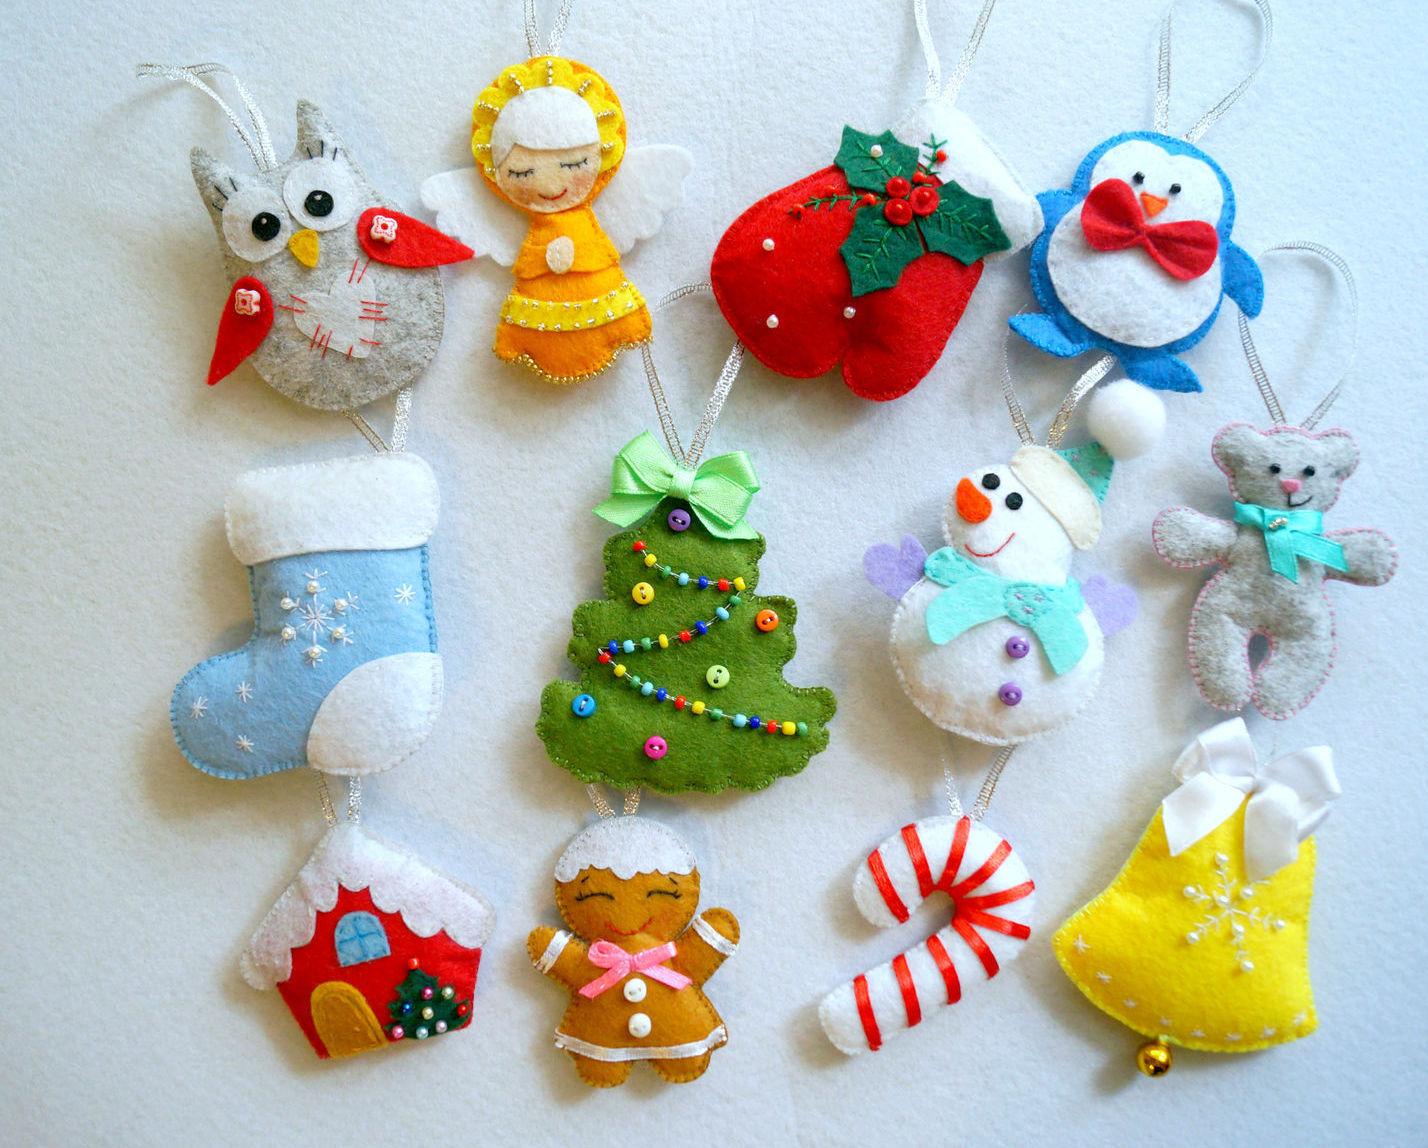 новогодние игрушки на елку из фетра